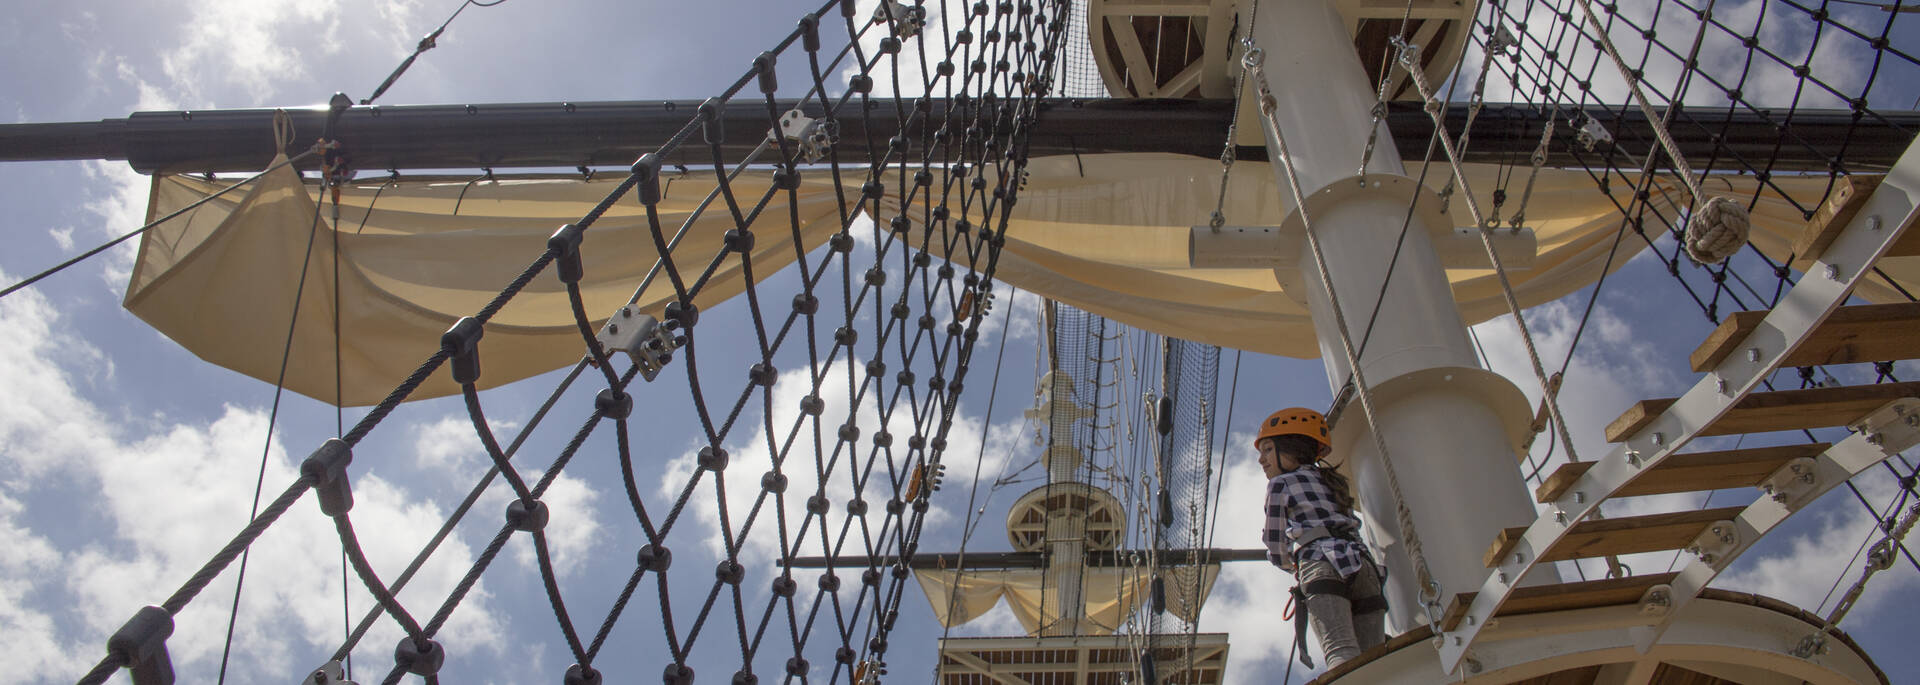 L'accro-mât à Rochefort ©S.David